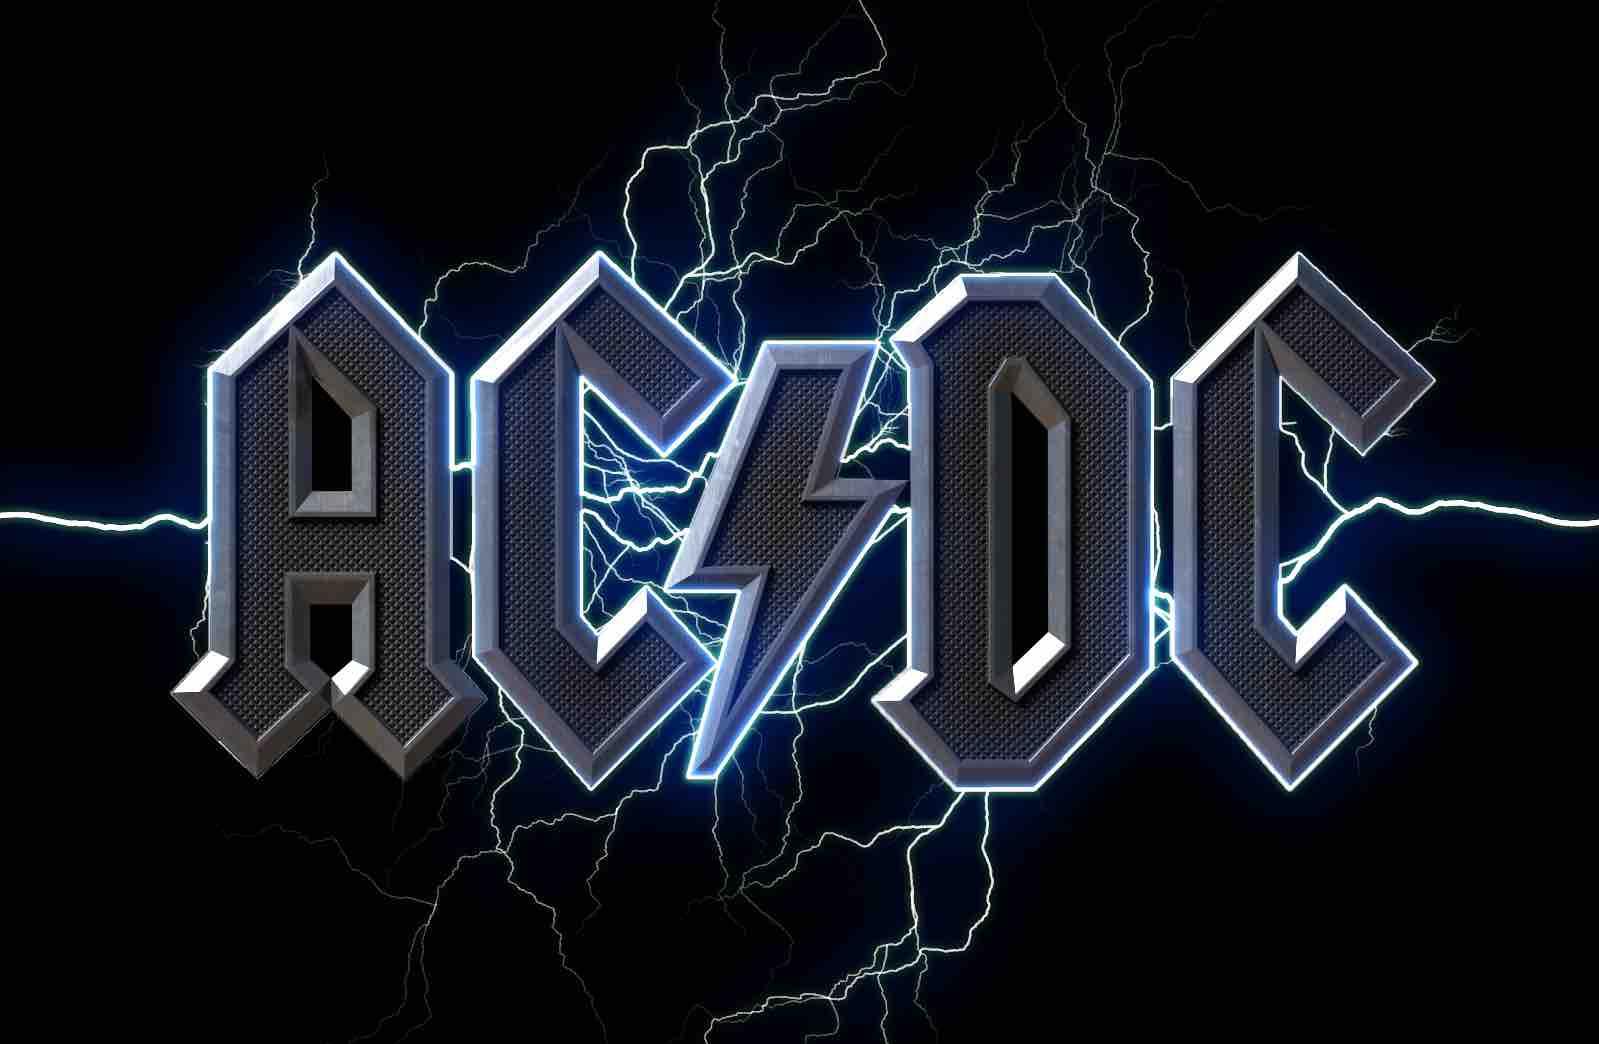 Ac dc concert 2020